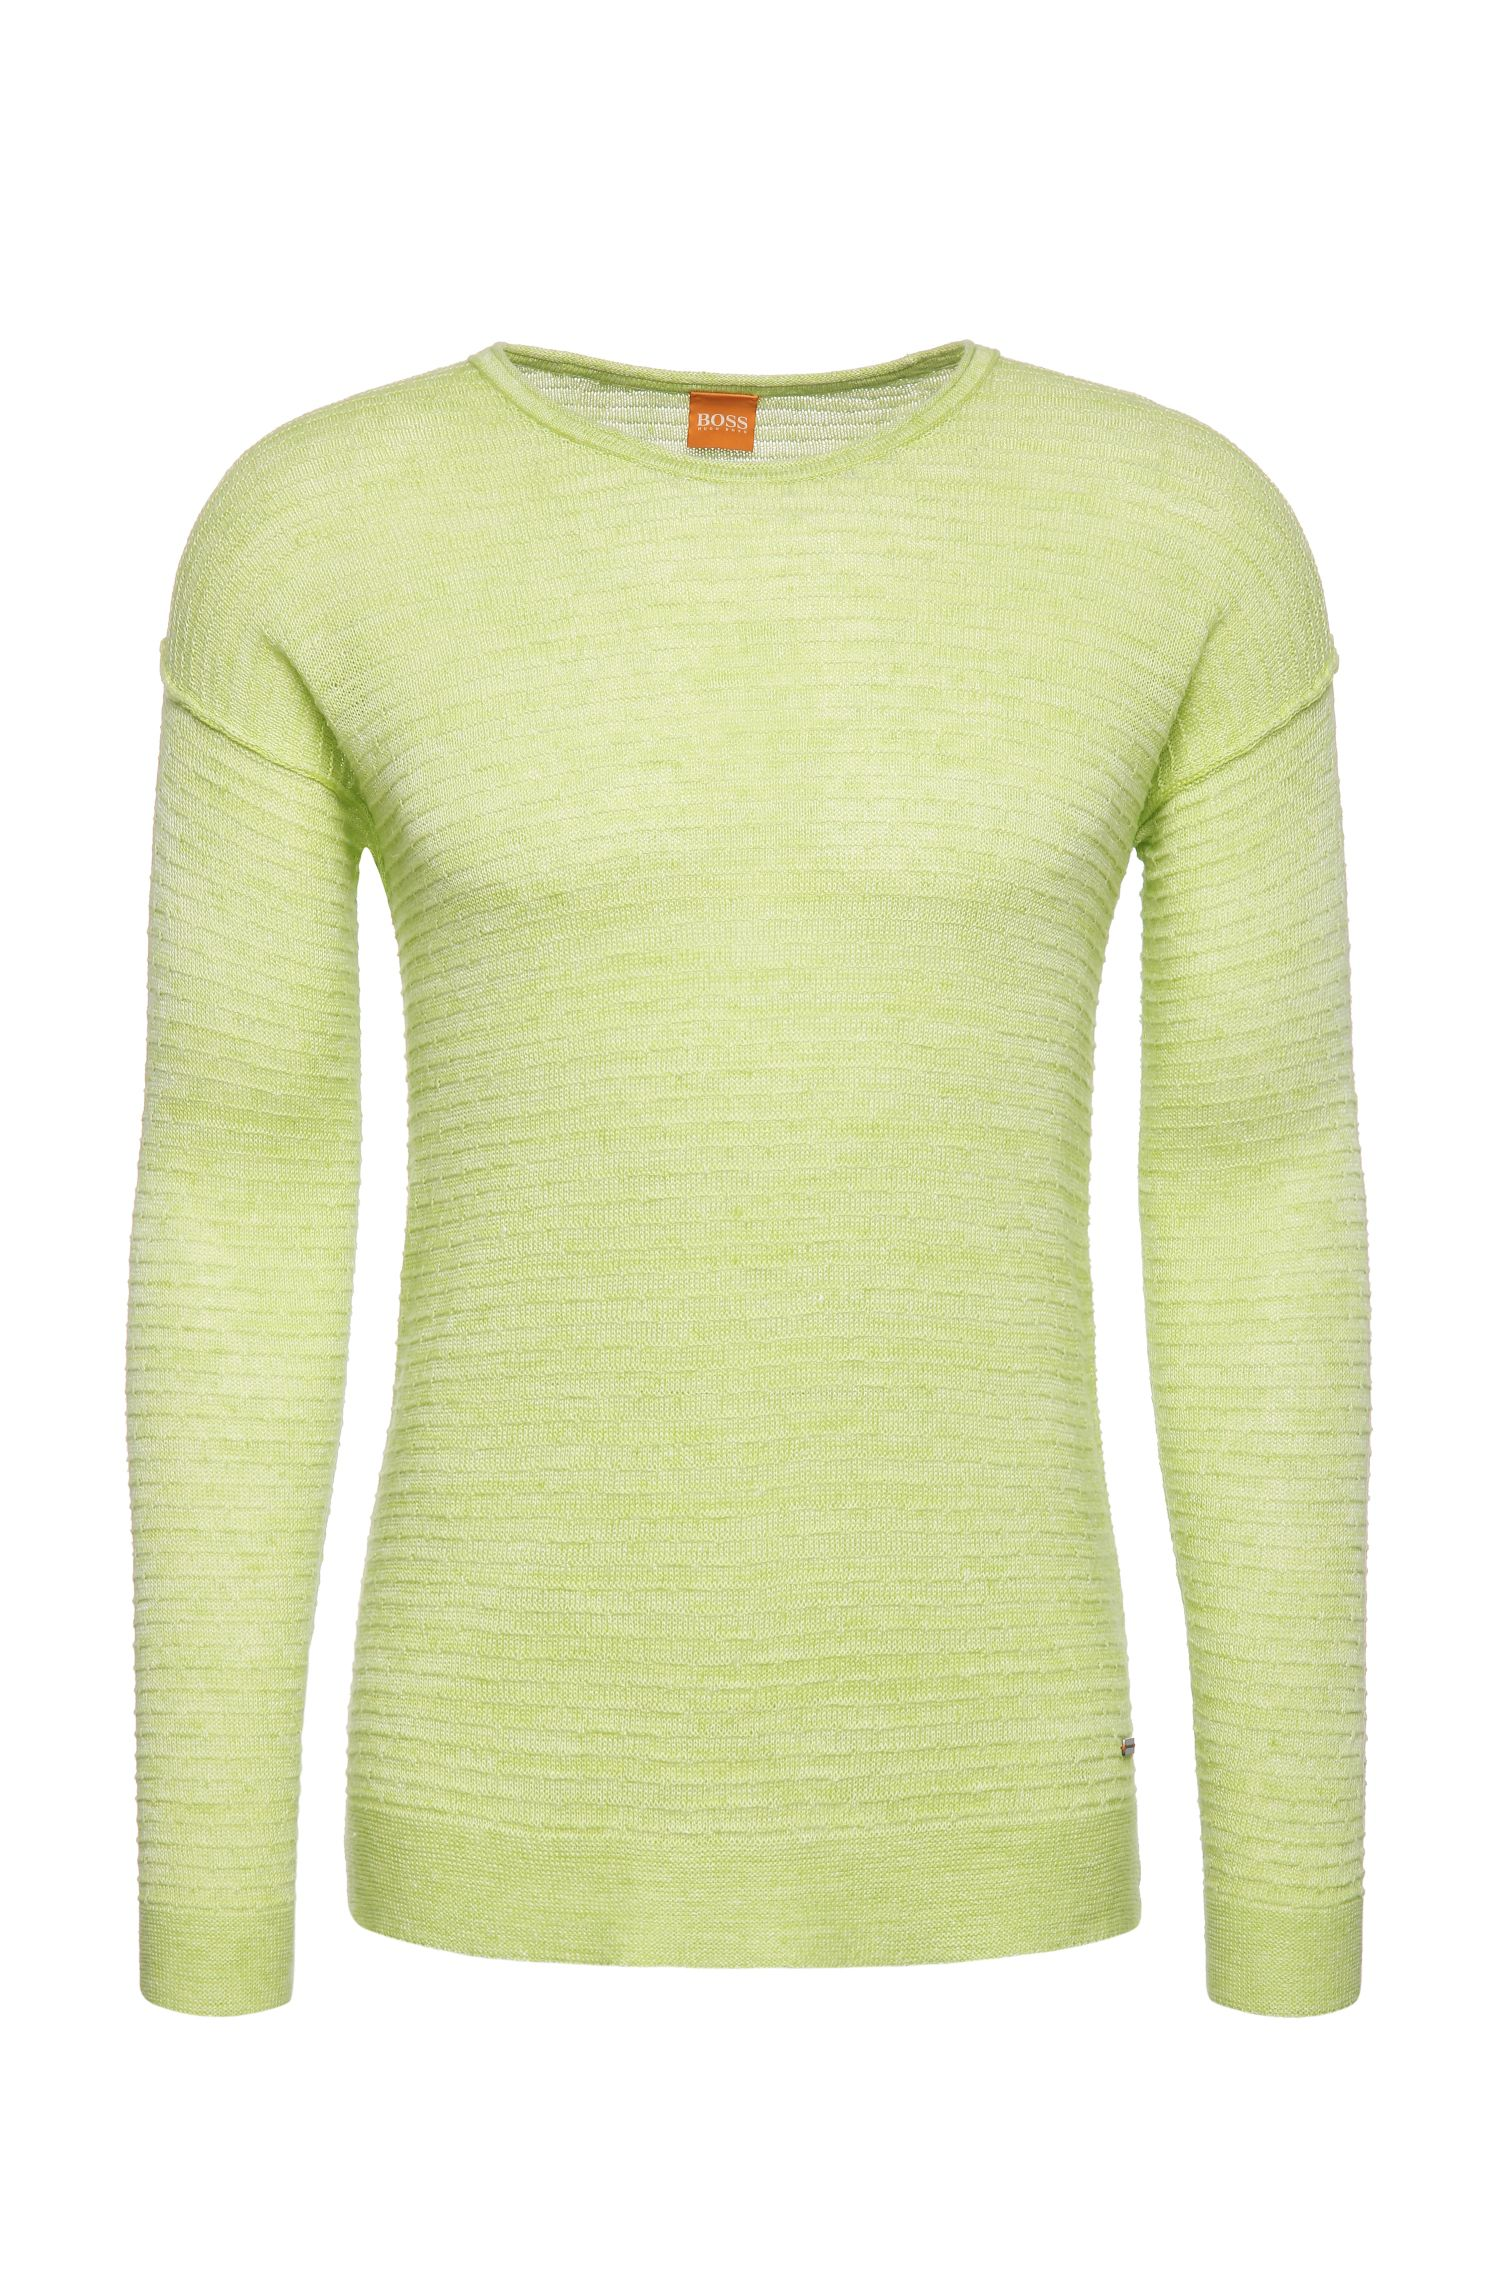 'Atounys' | Linen Cotton Sweater